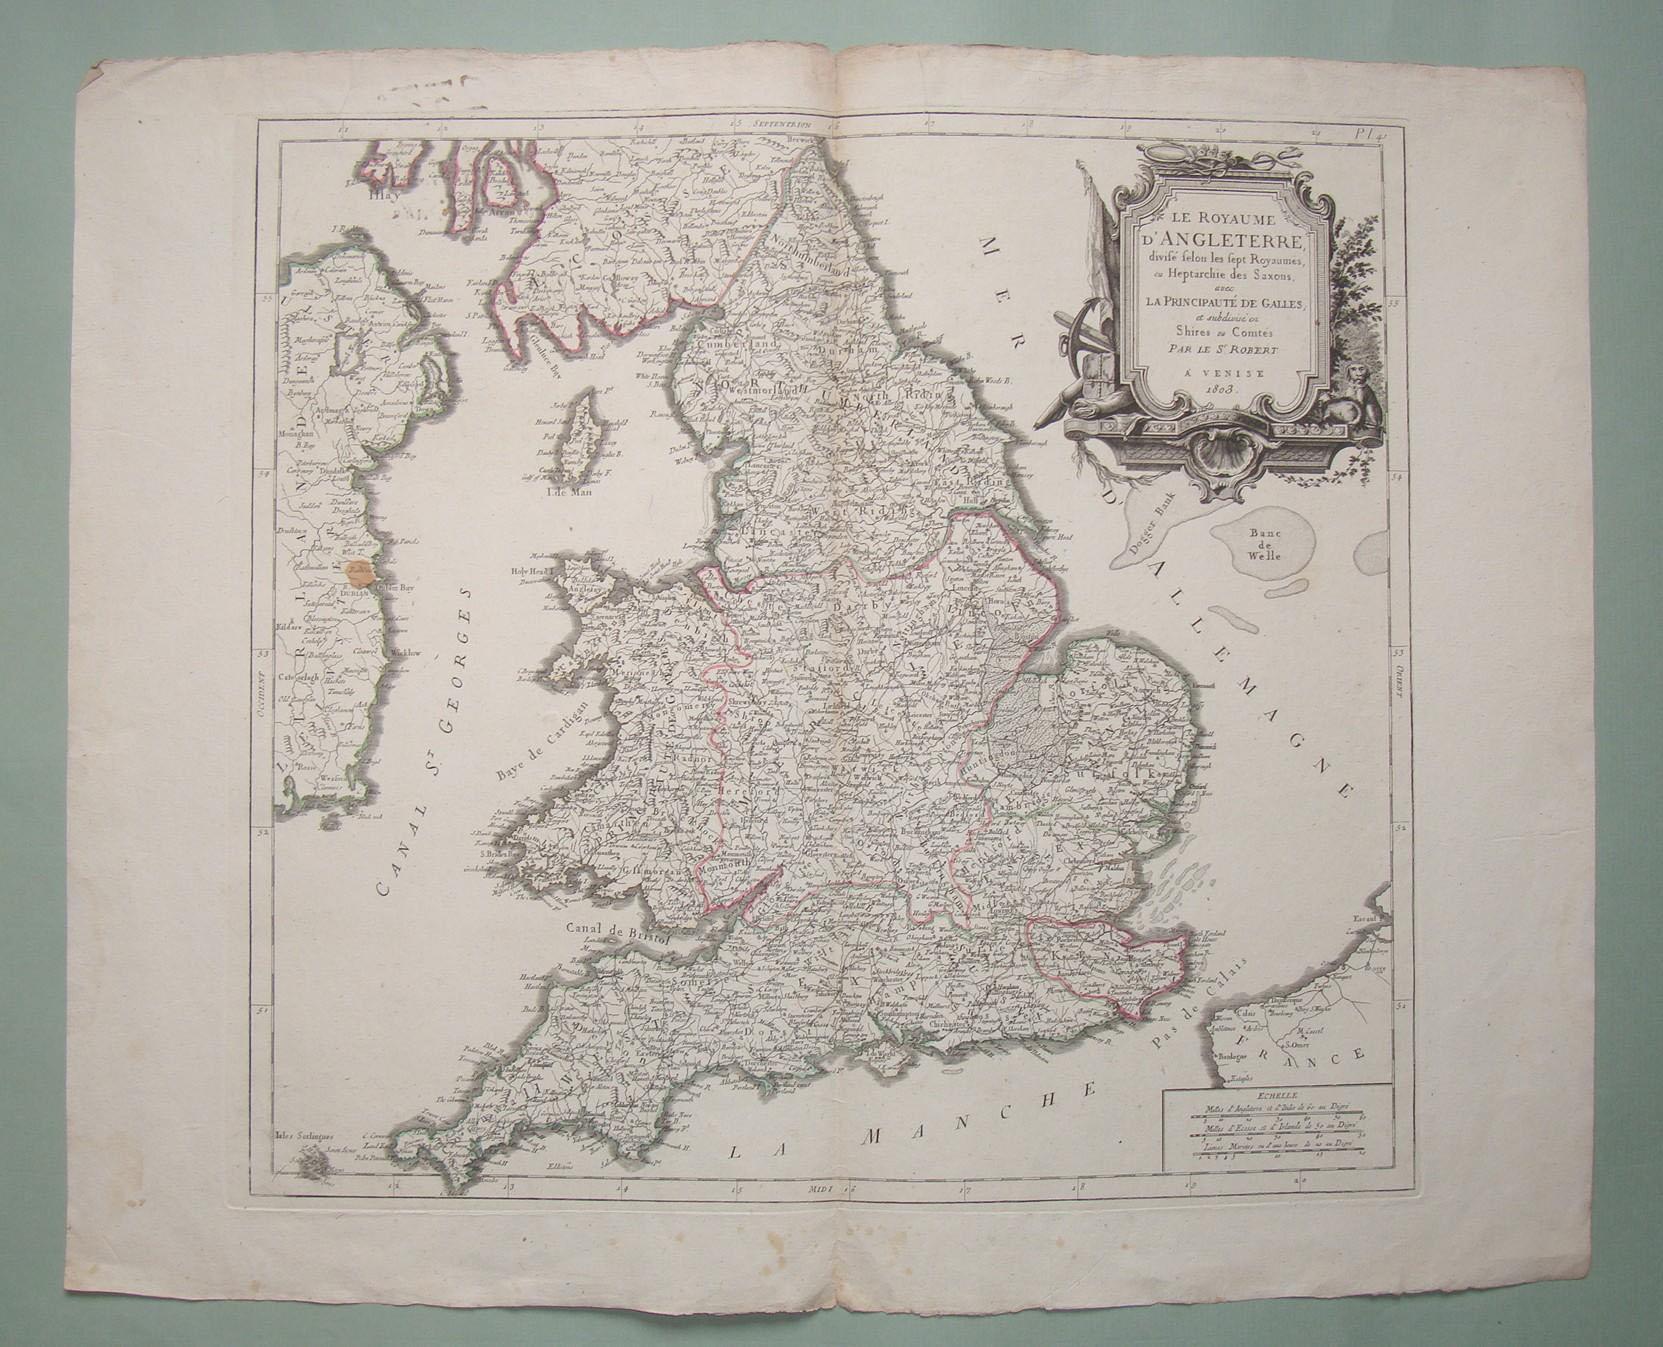 Mappa dell'Inghilterra